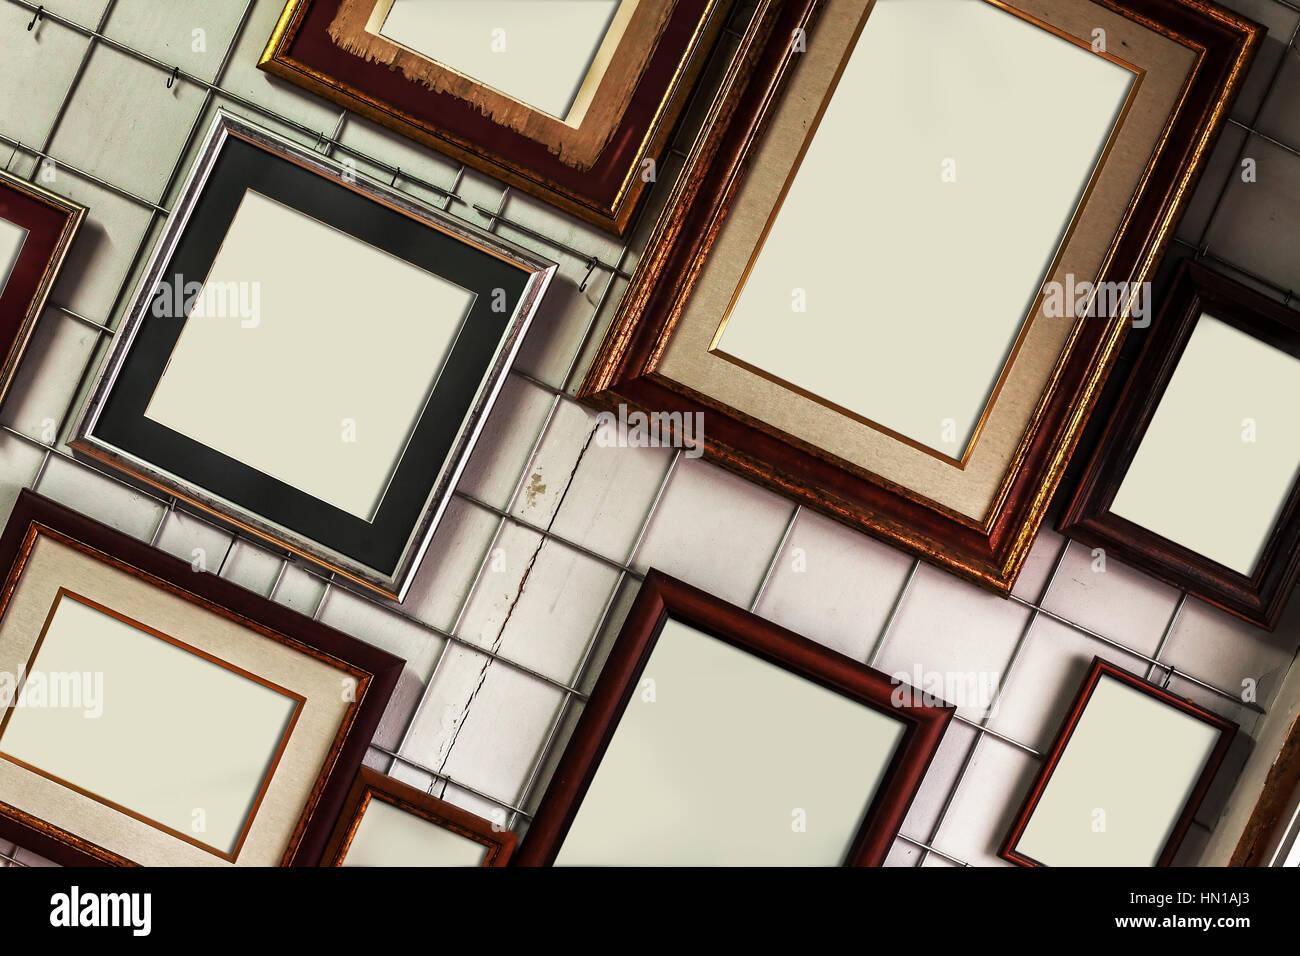 Empty Frames Stockfotos & Empty Frames Bilder - Alamy